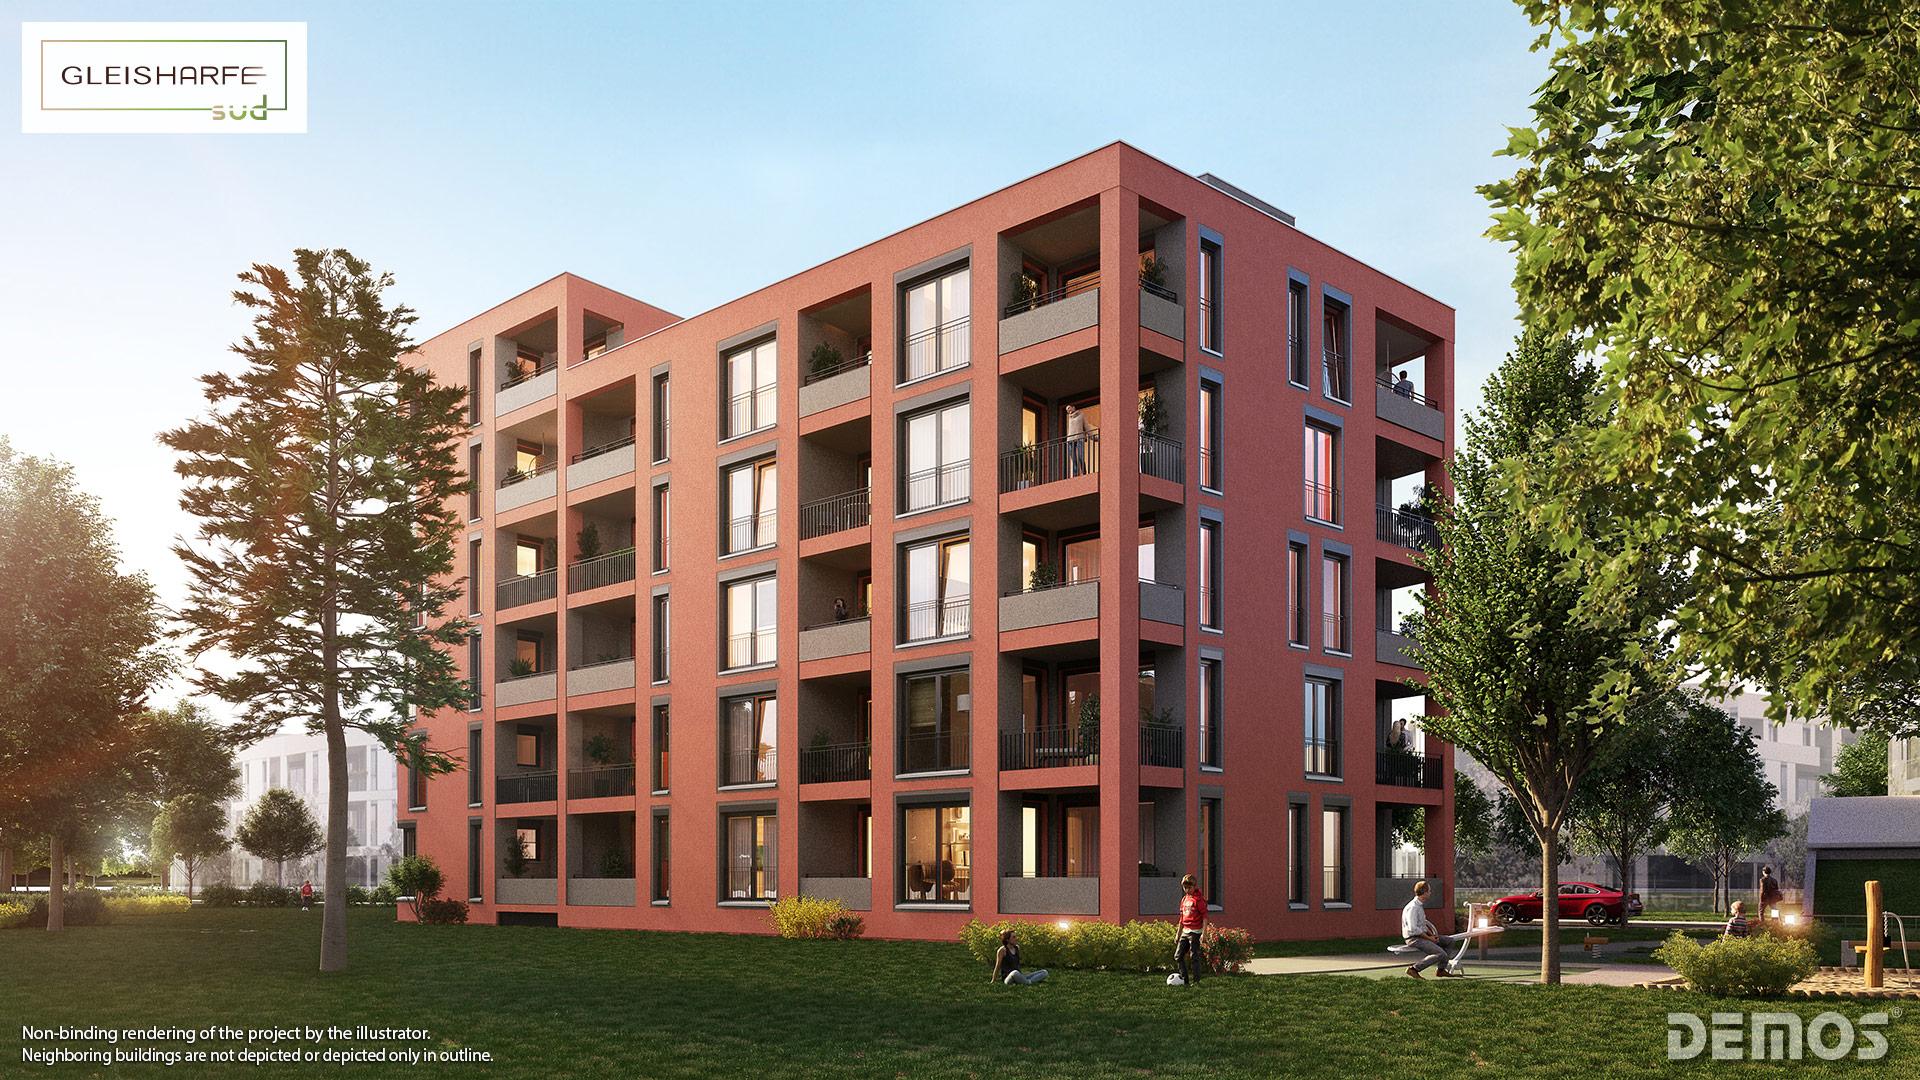 Property Gleisharfe Süd - Illustration 4